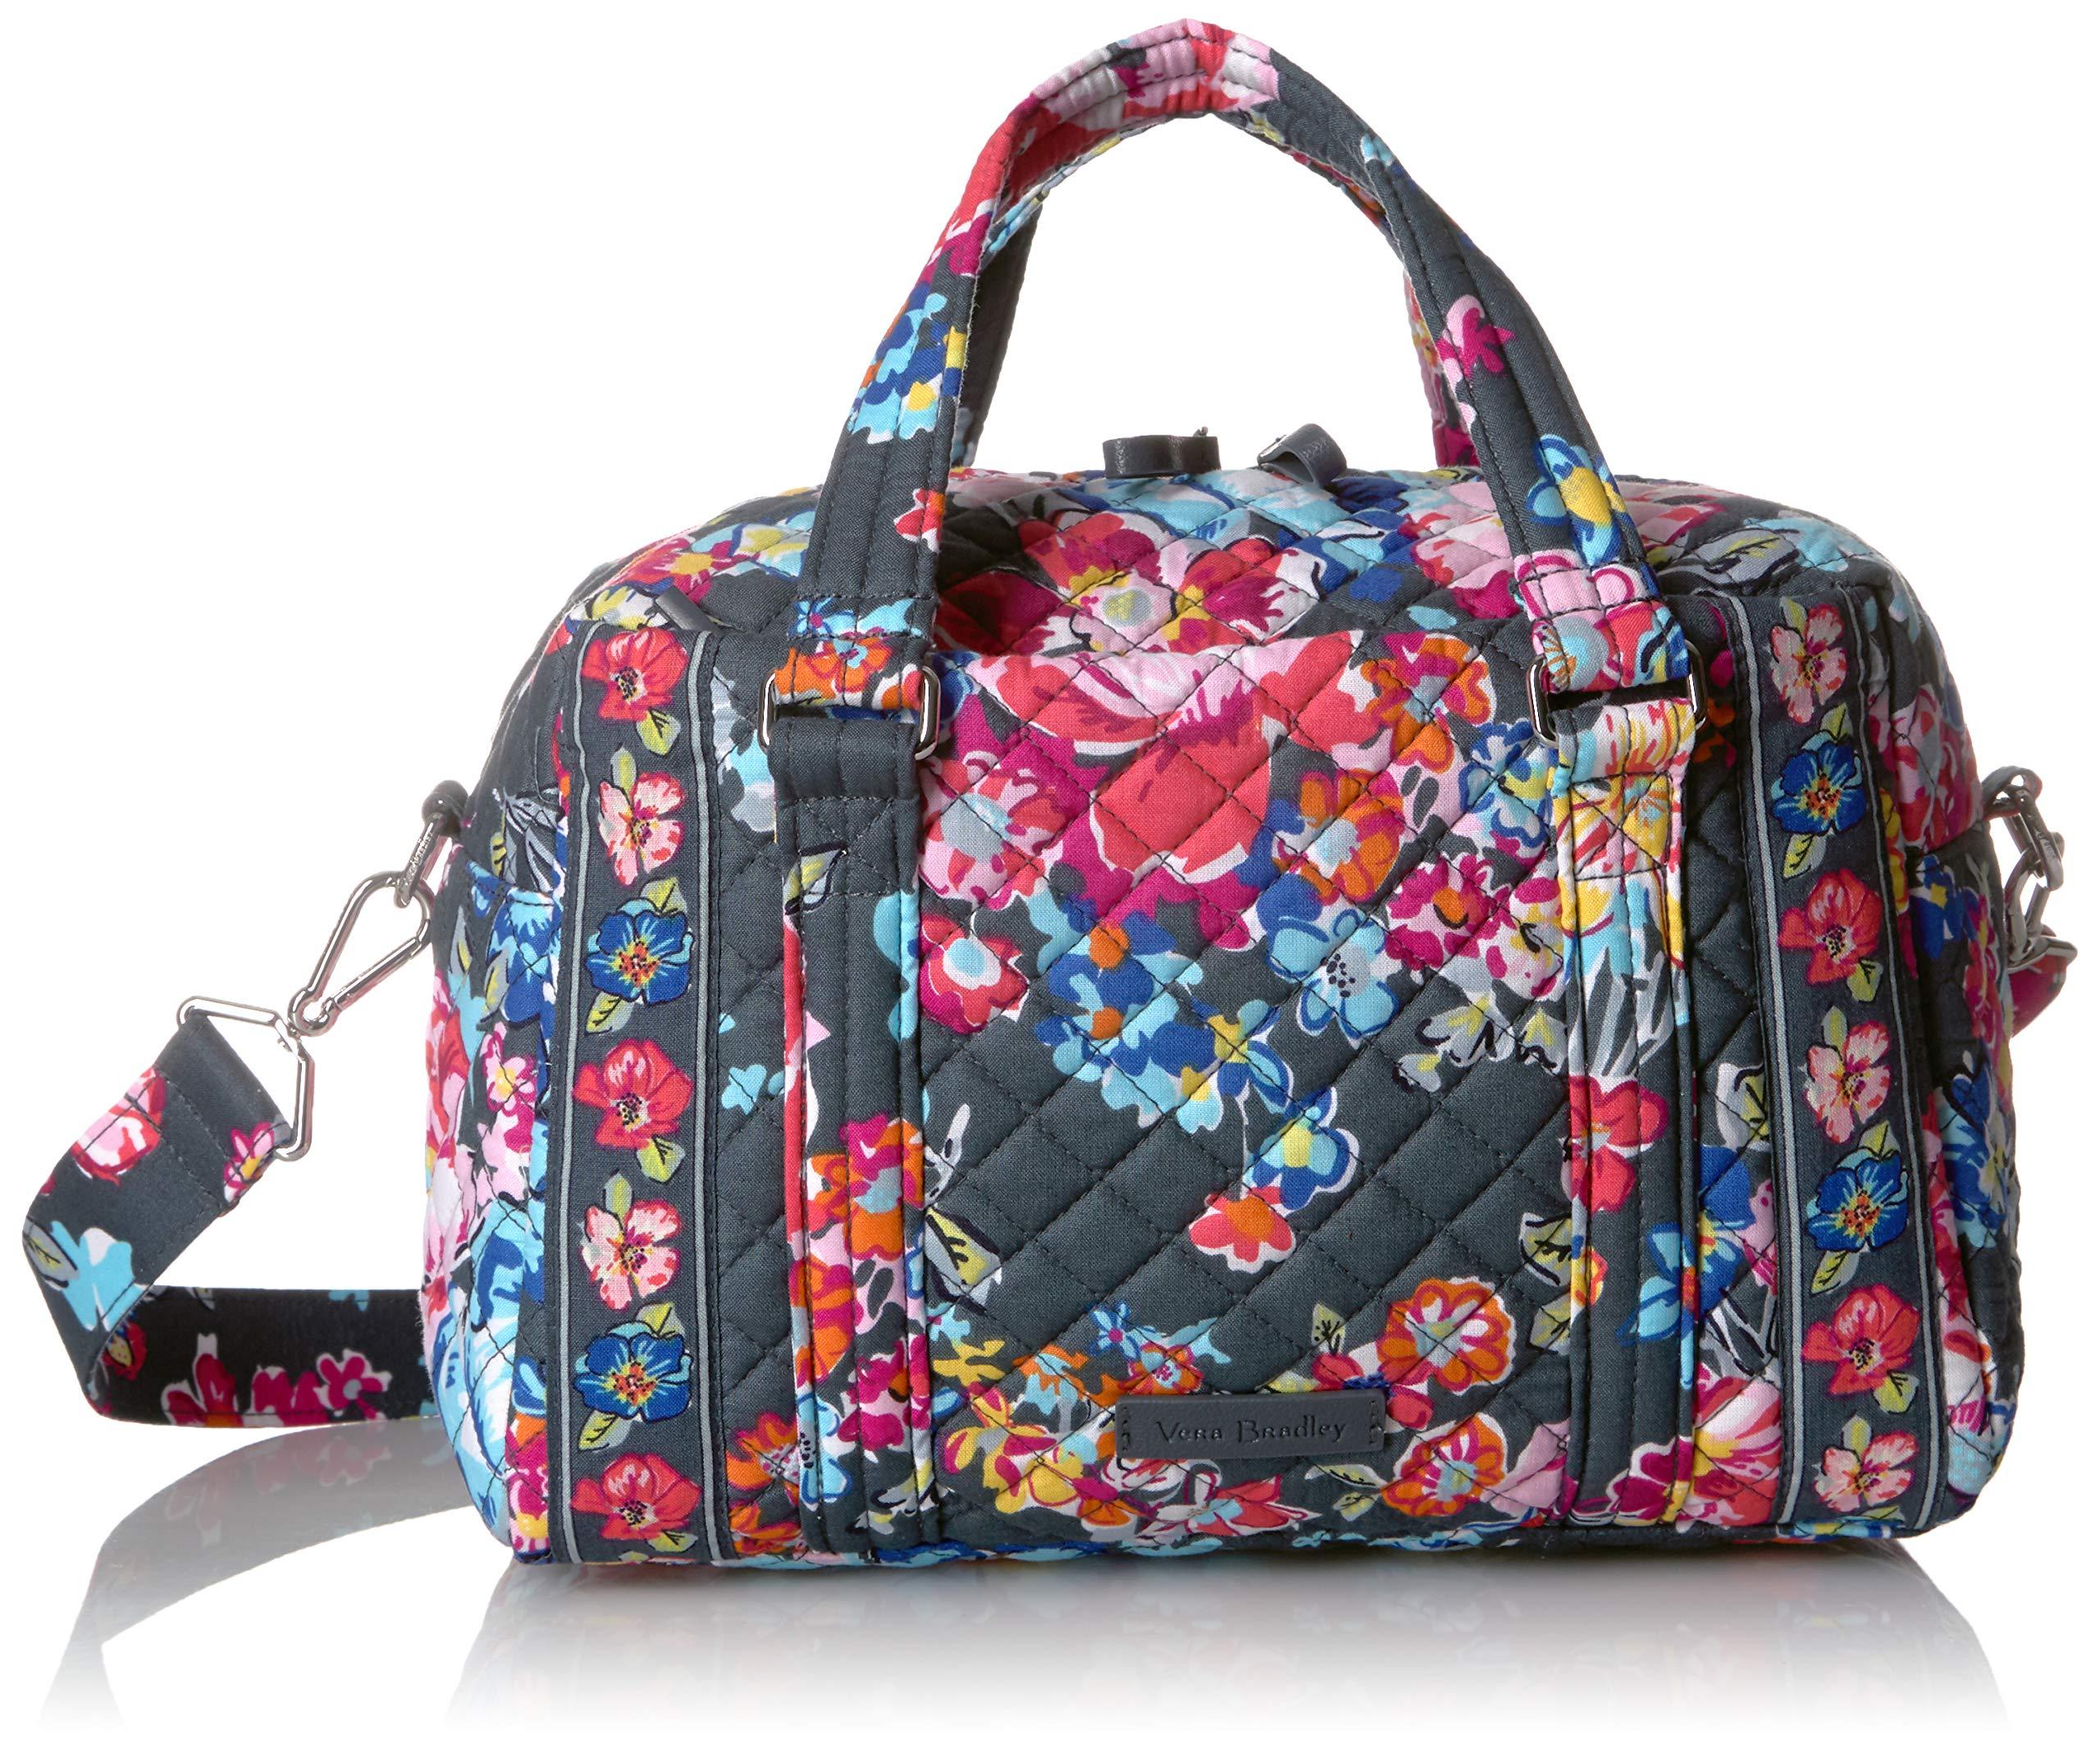 Vera Bradley Iconic 100 Handbag, Signature Cotton, pretty Posies